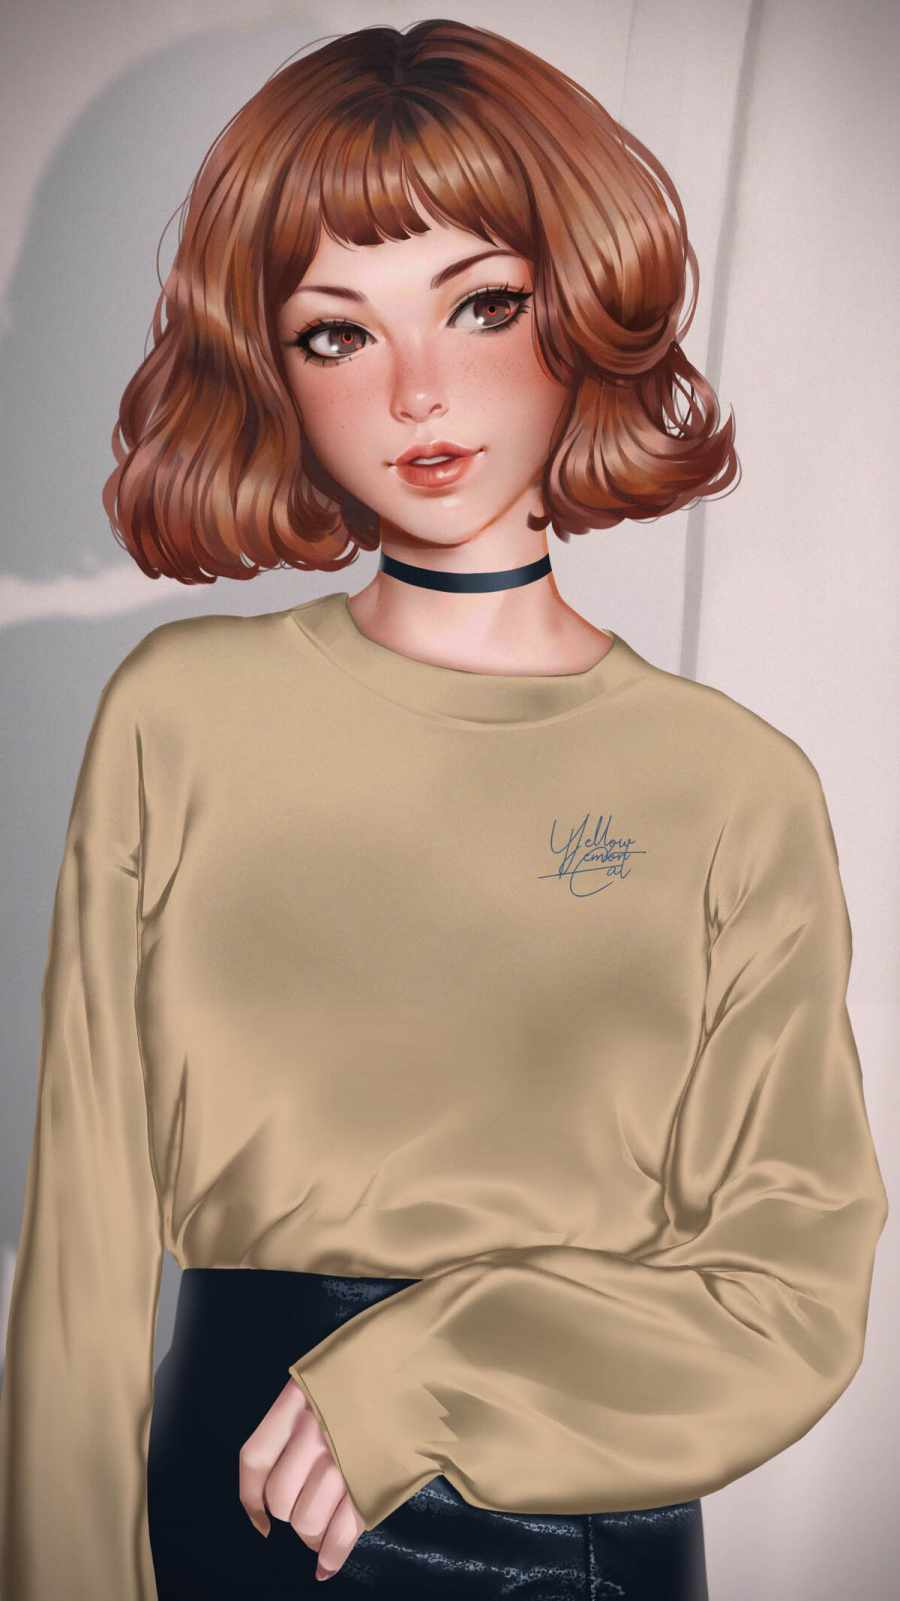 Beautiful Brunette Girl iPhone Wallpaper